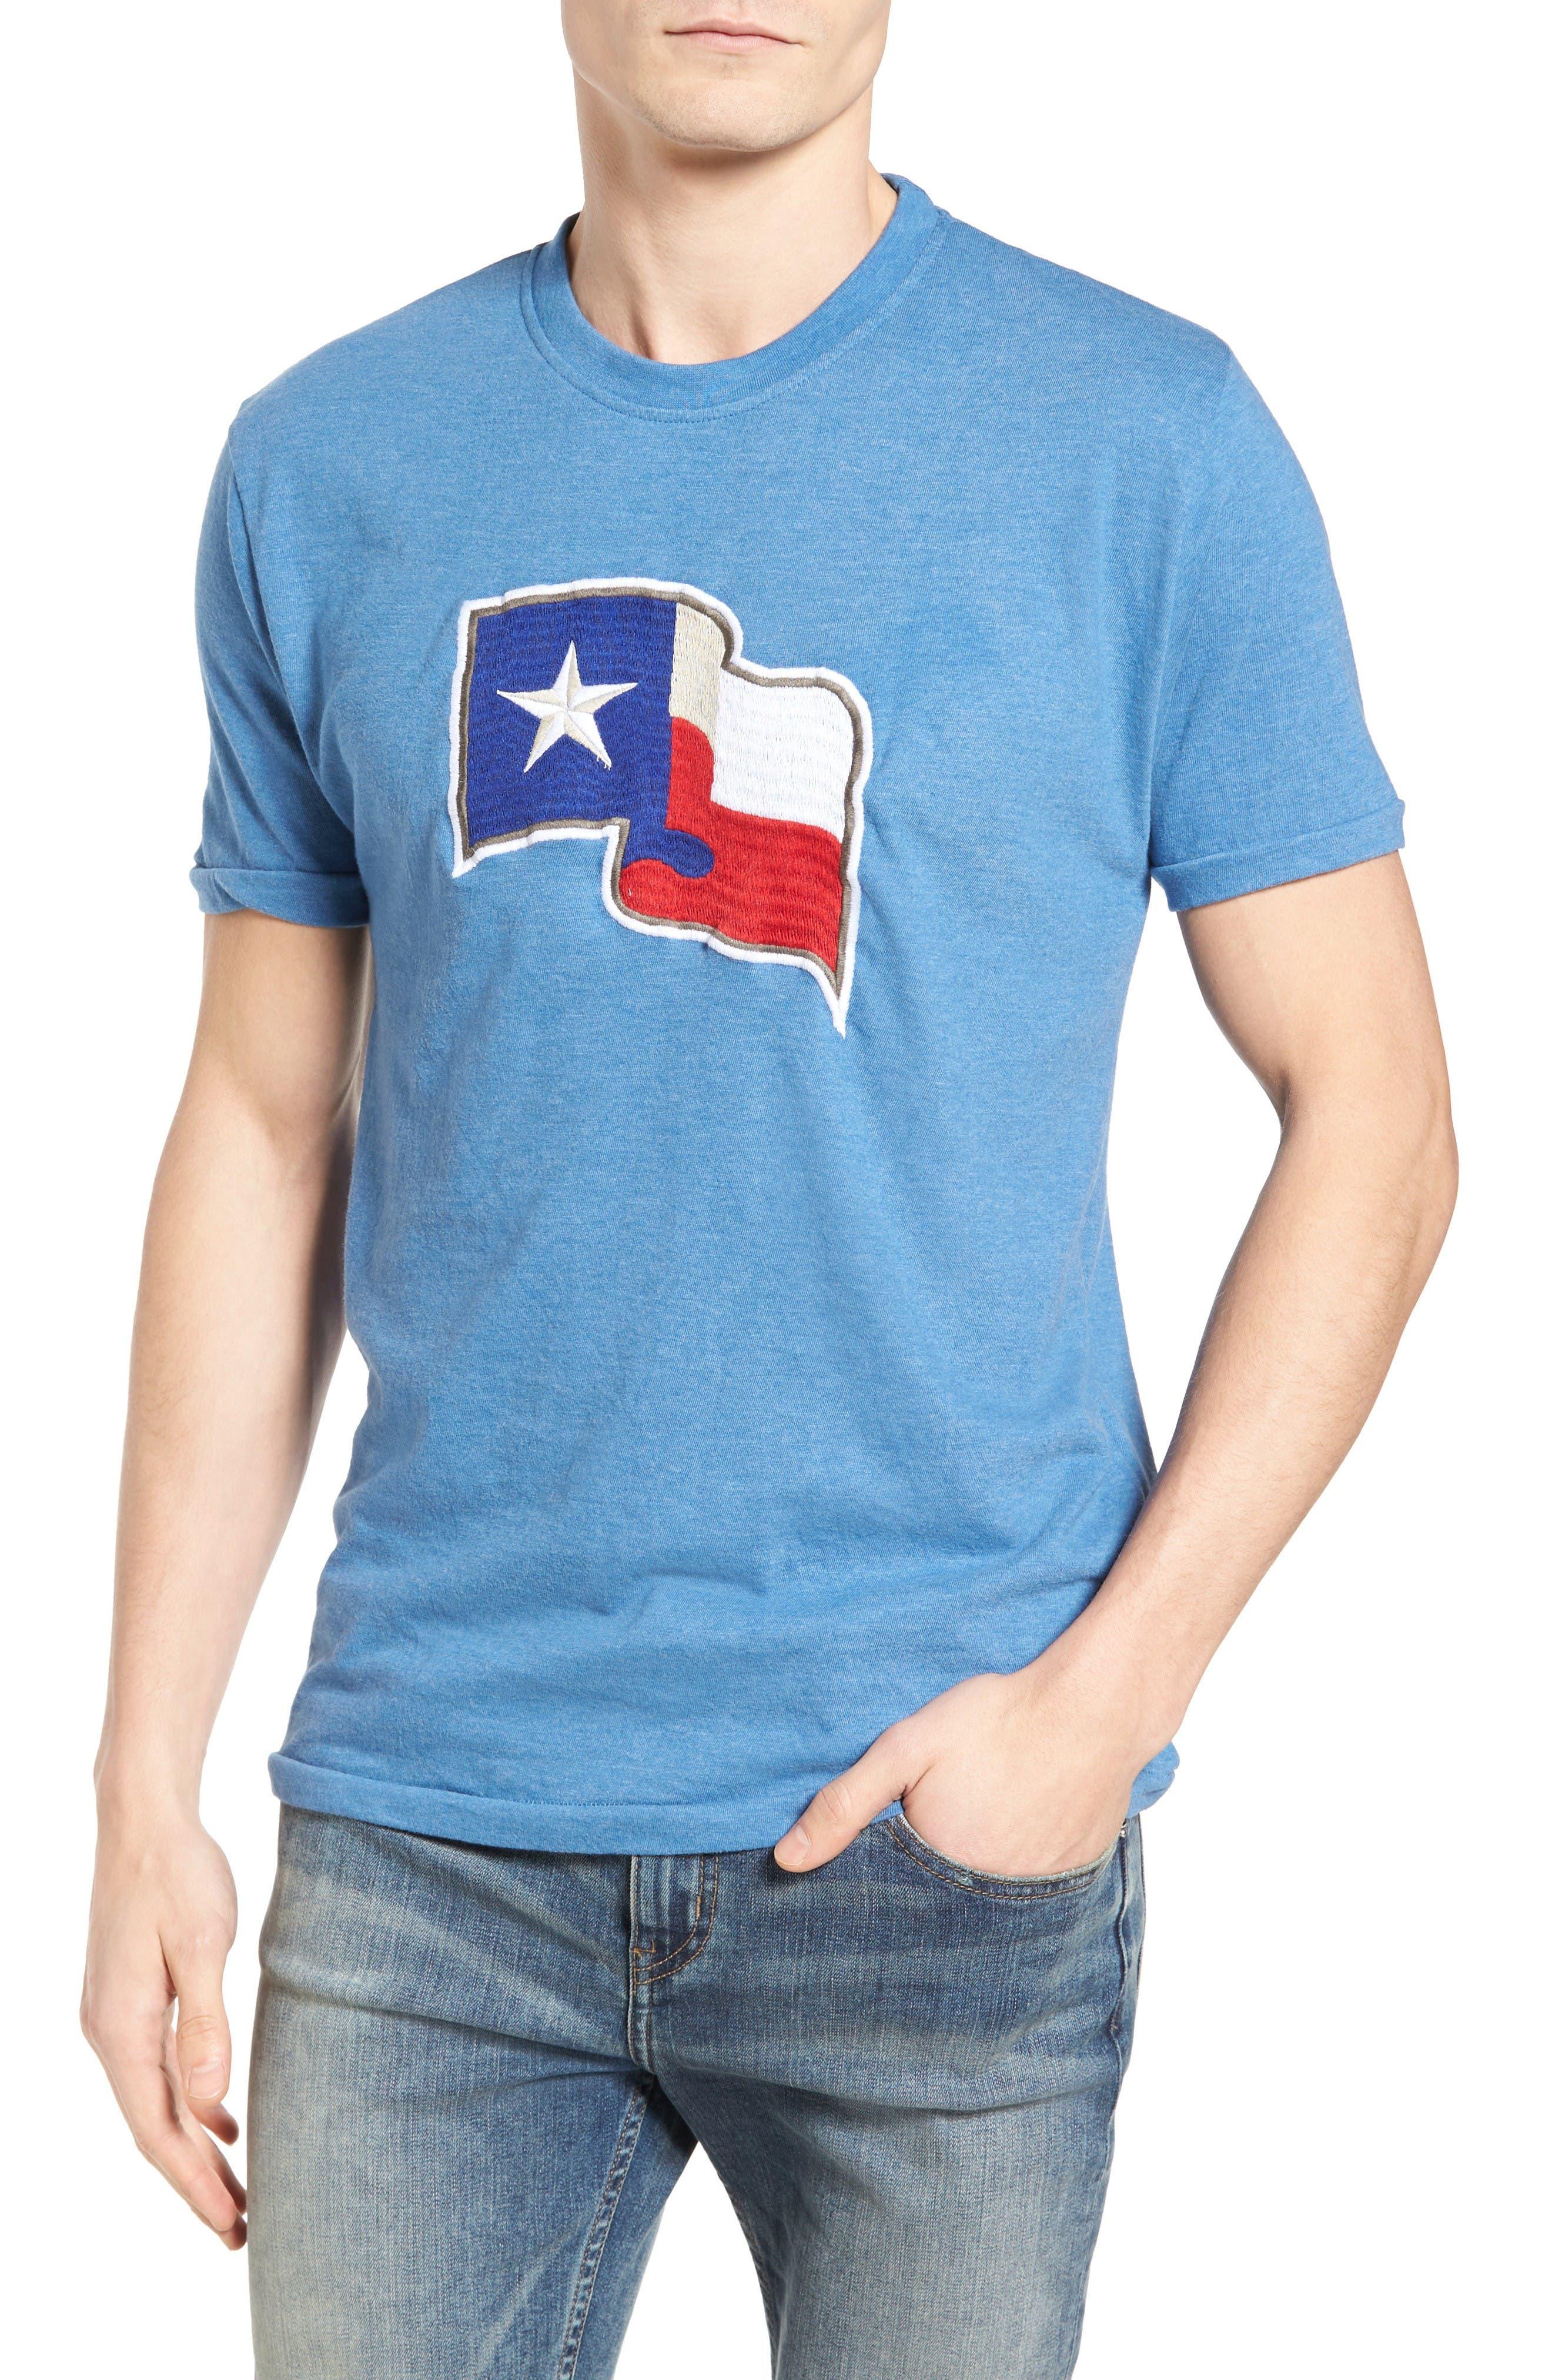 Main Image - American Needle Hillwood Texas Rangers T-Shirt